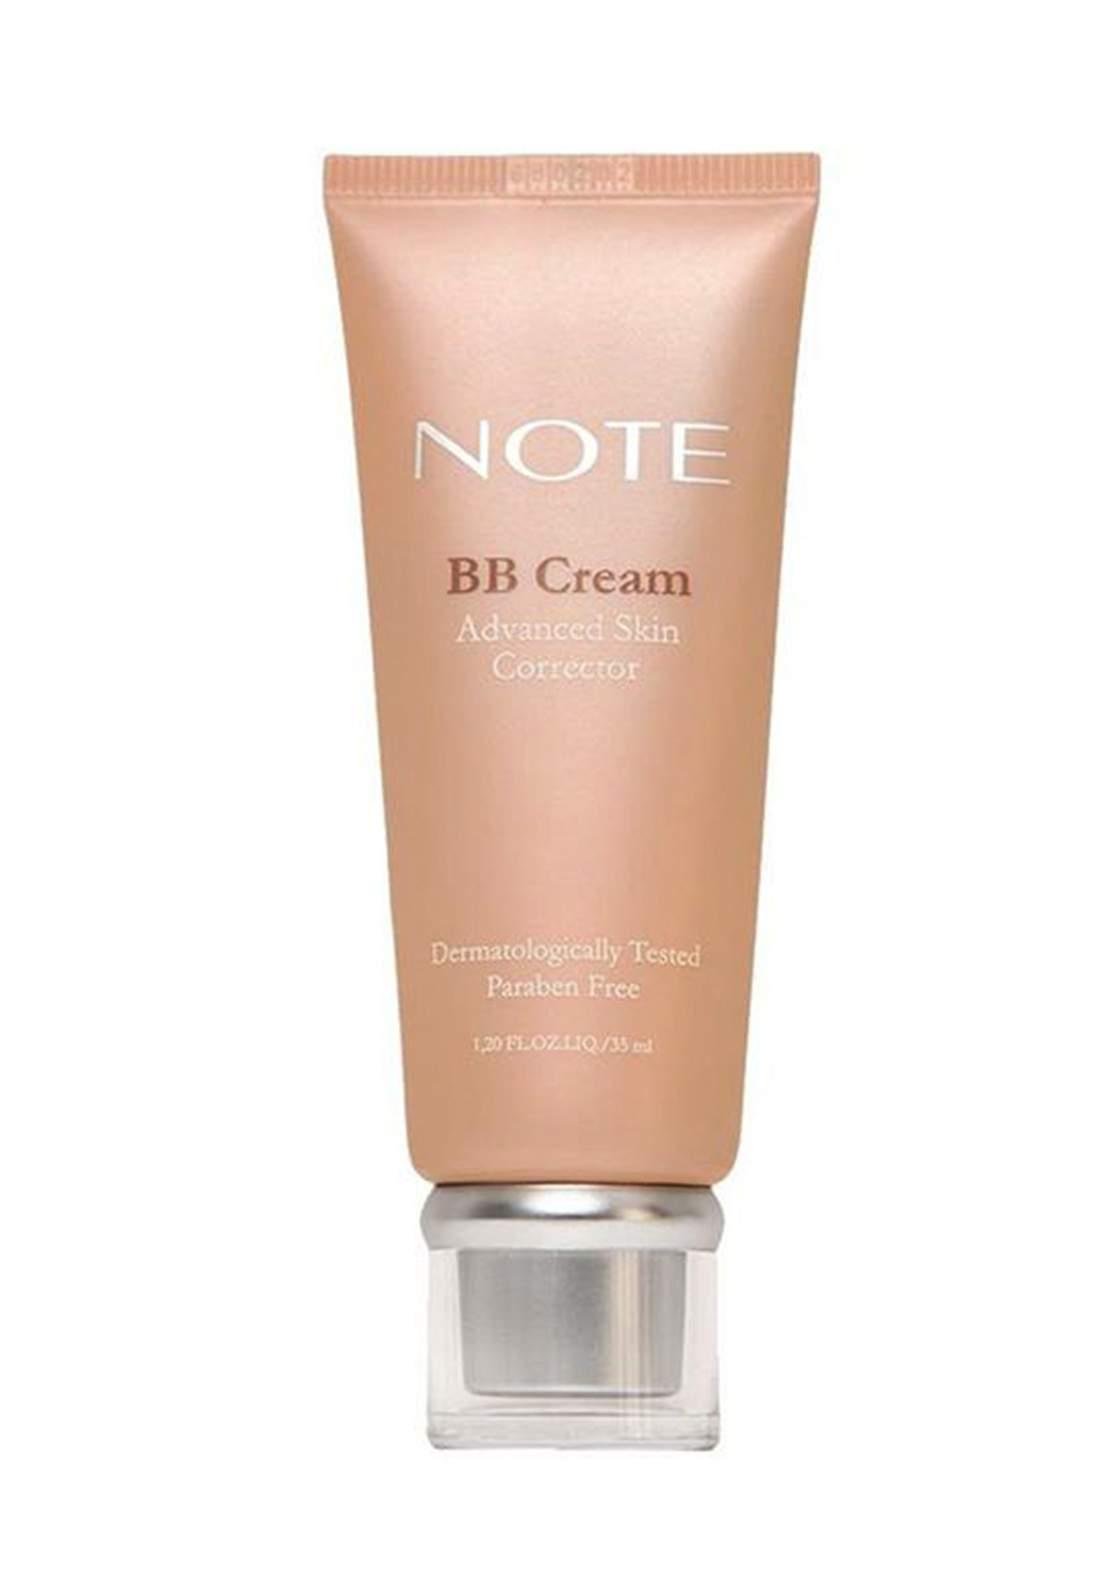 Note BB Cream Skin Corrective No.500  35 ml بي بي كريم مصحح للبشرة